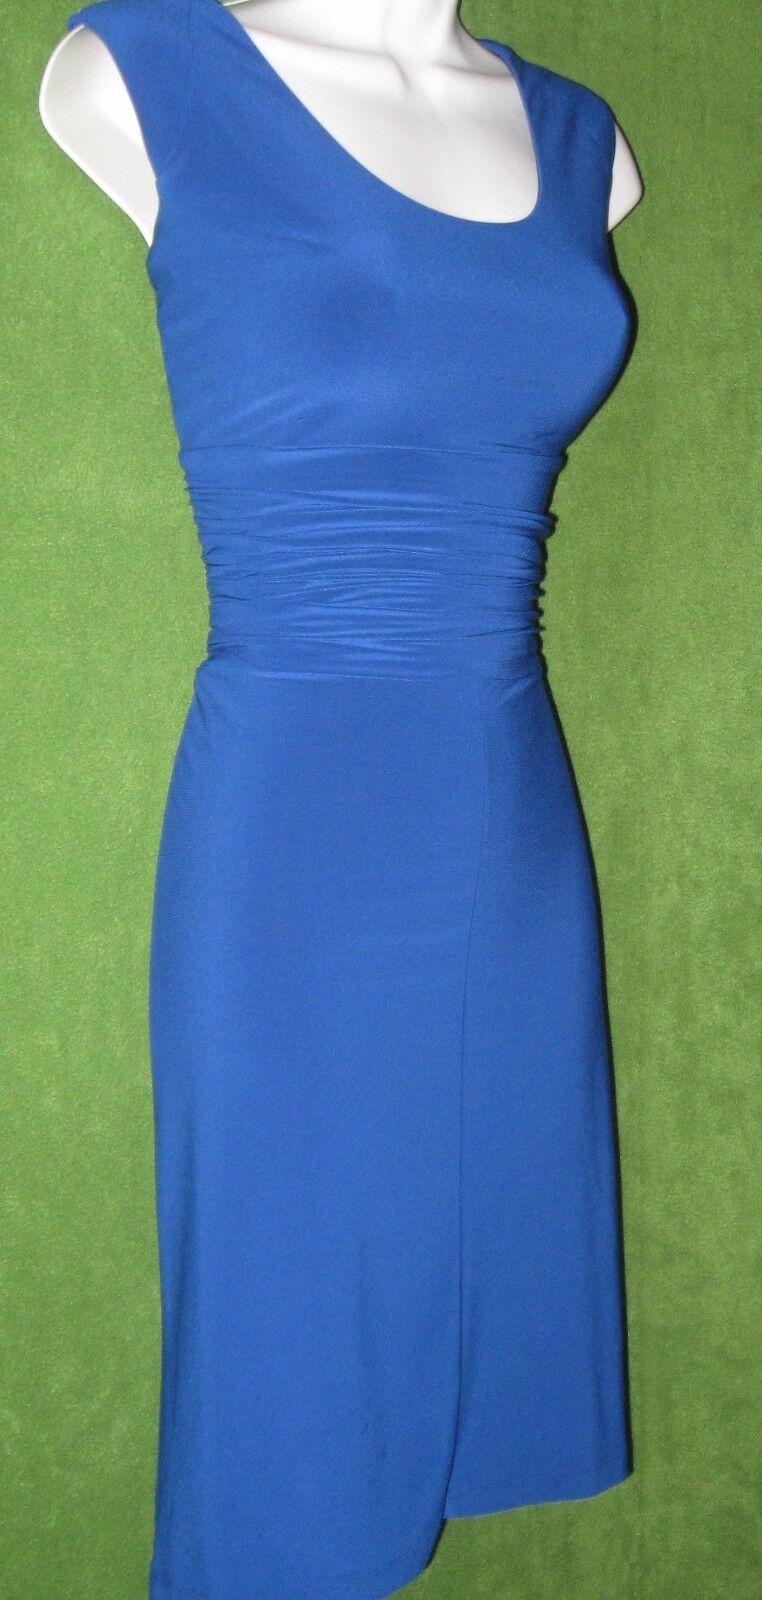 Nine West Regal bluee Stretch Jersey Ruched Versatile Work Social Dress 8